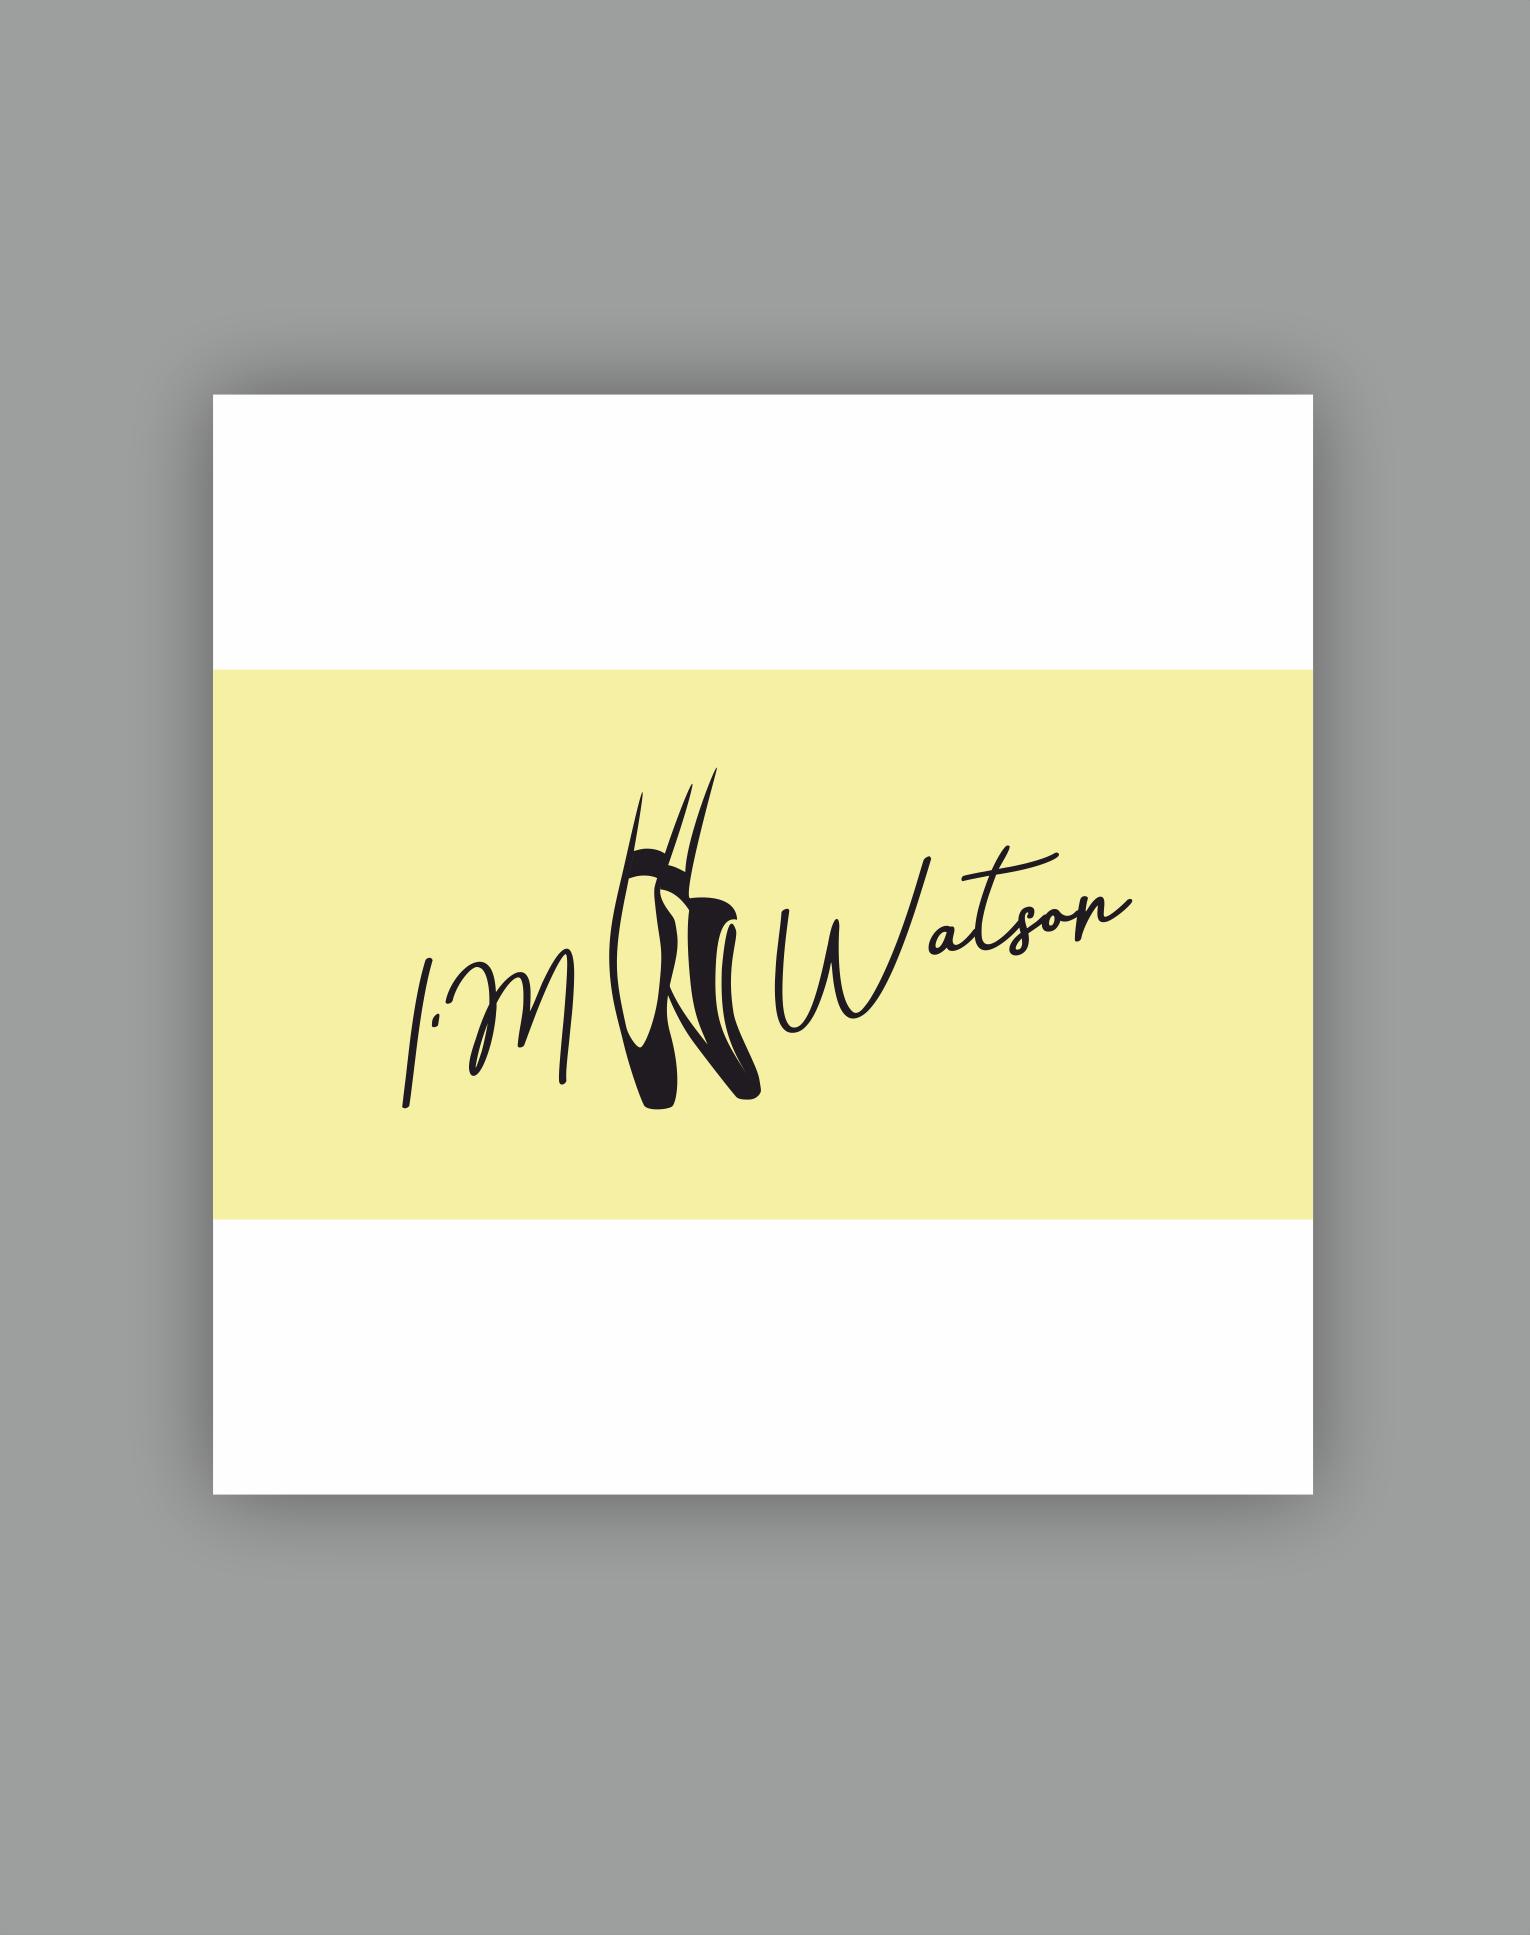 Разработать логотип для балетного бренда фото f_1065bc4f64660aff.png